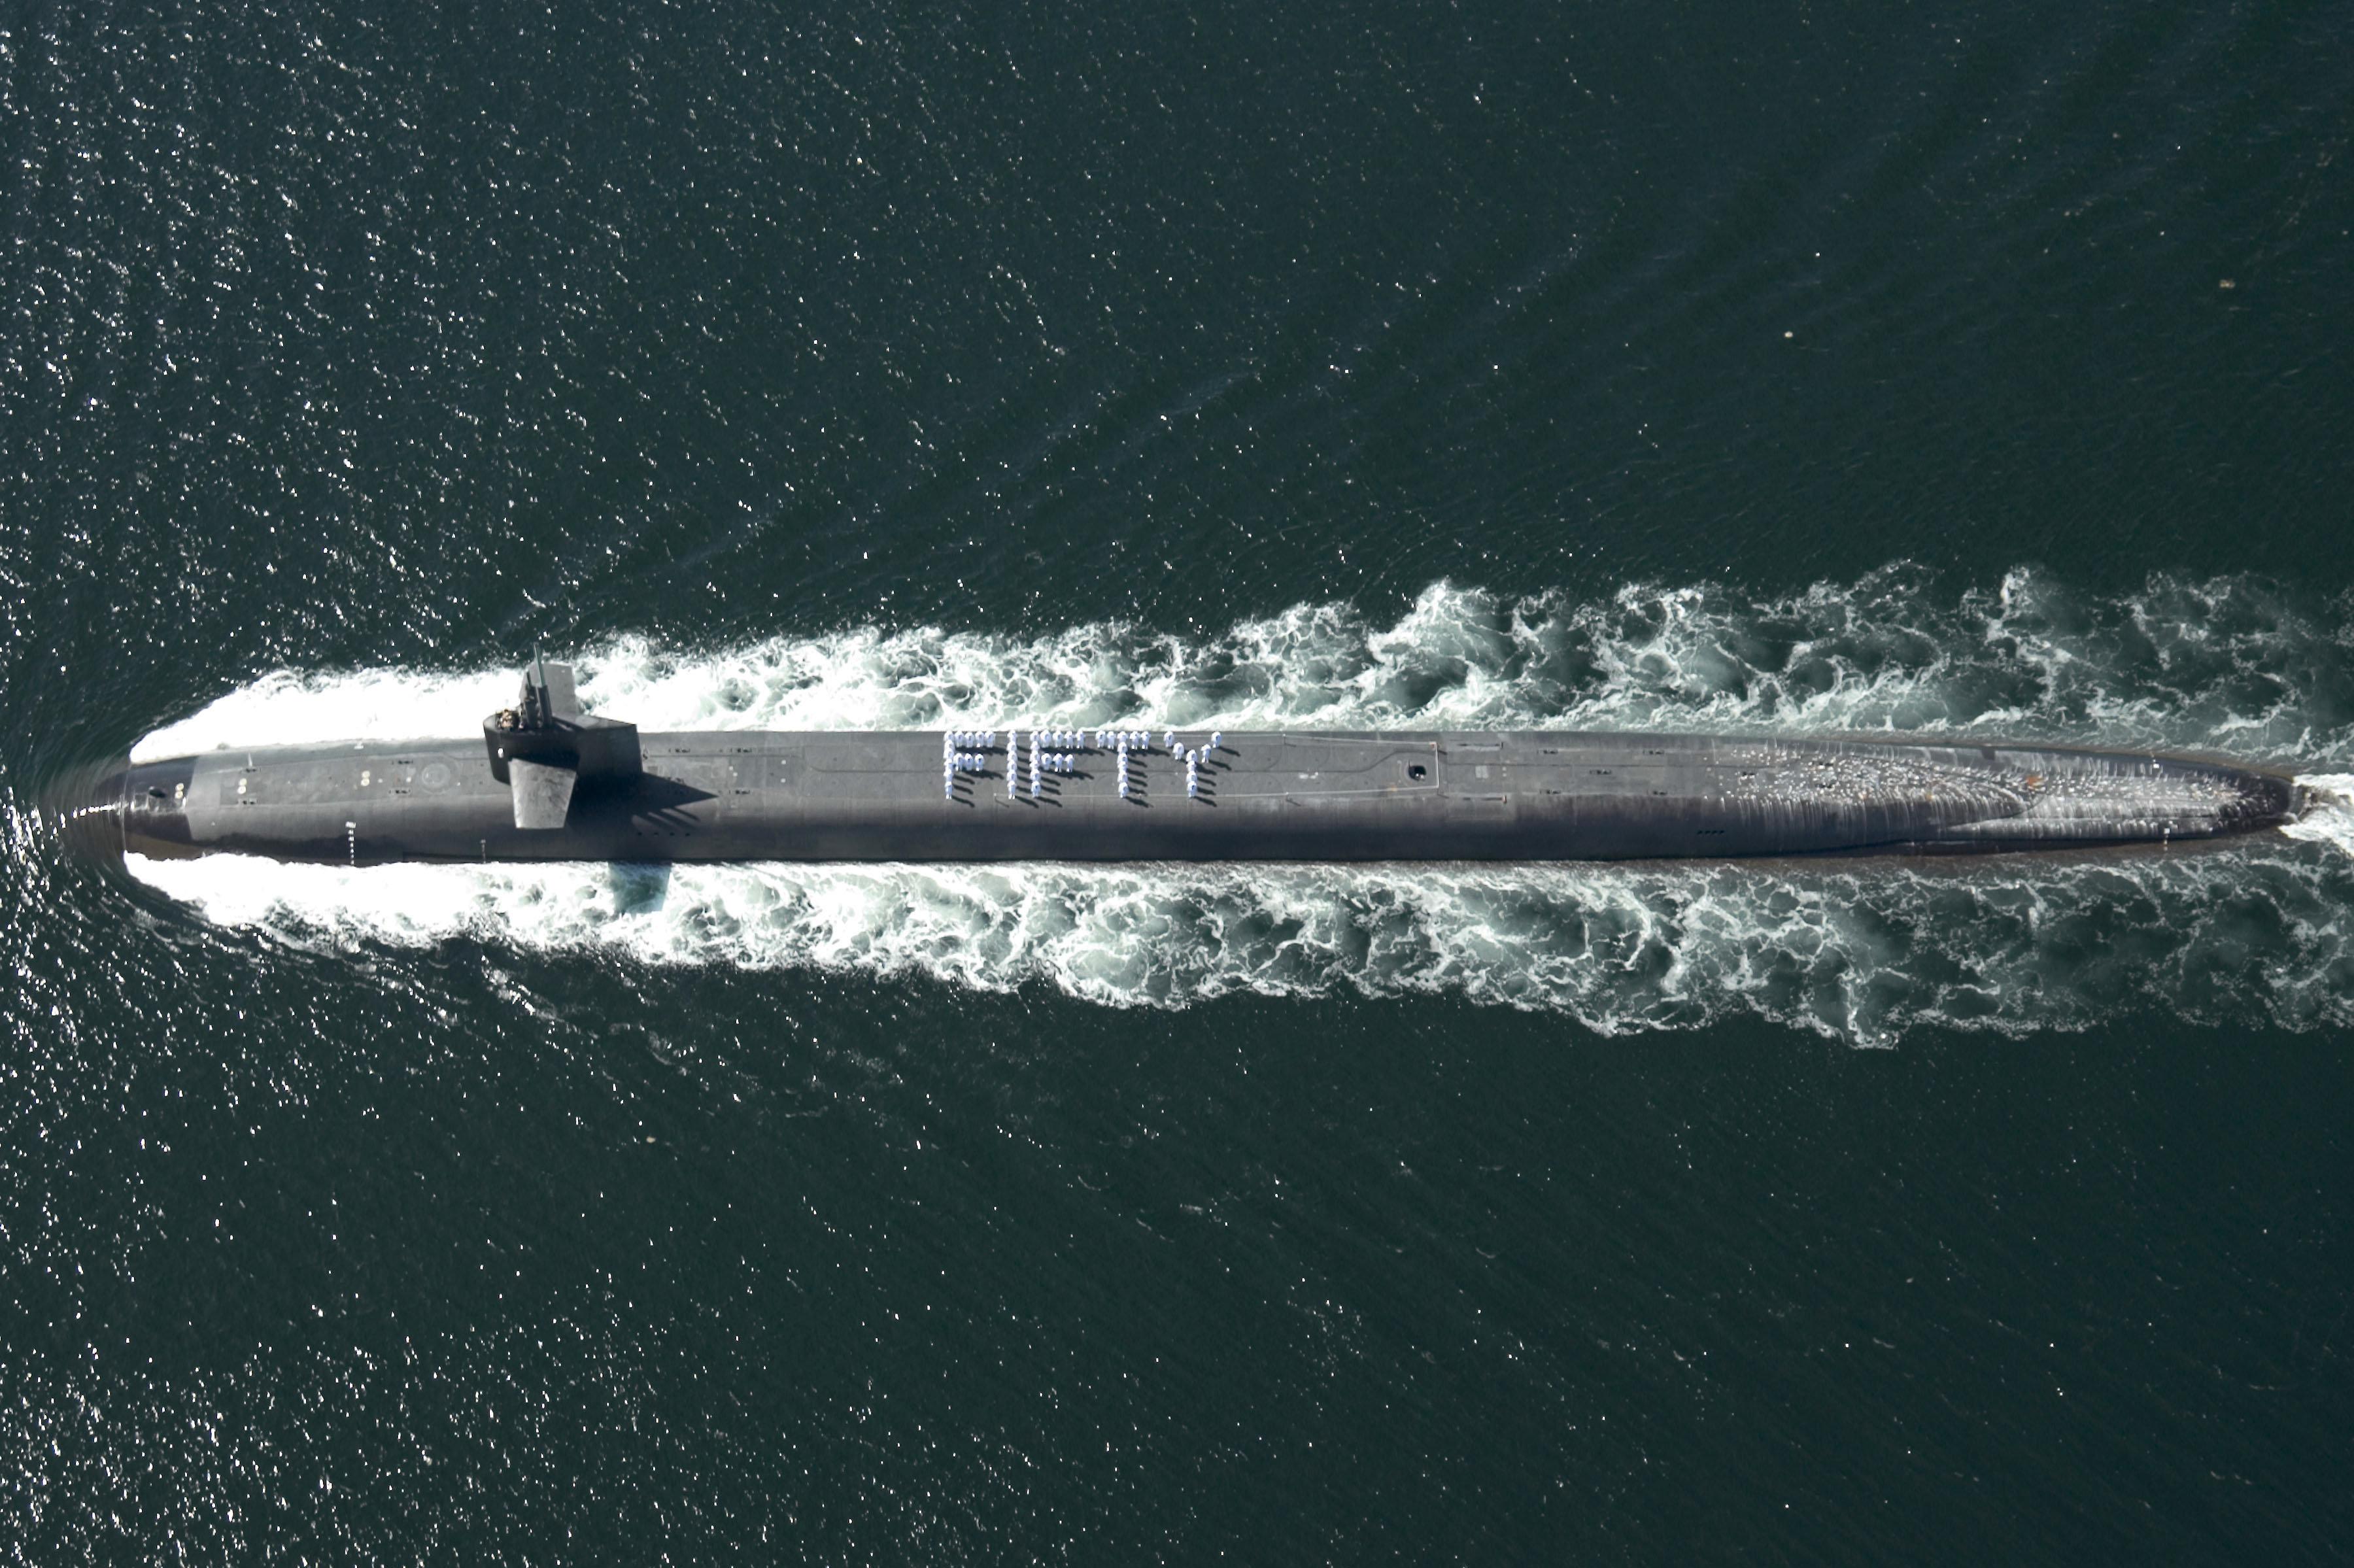 Un submarino de la clase Ohio